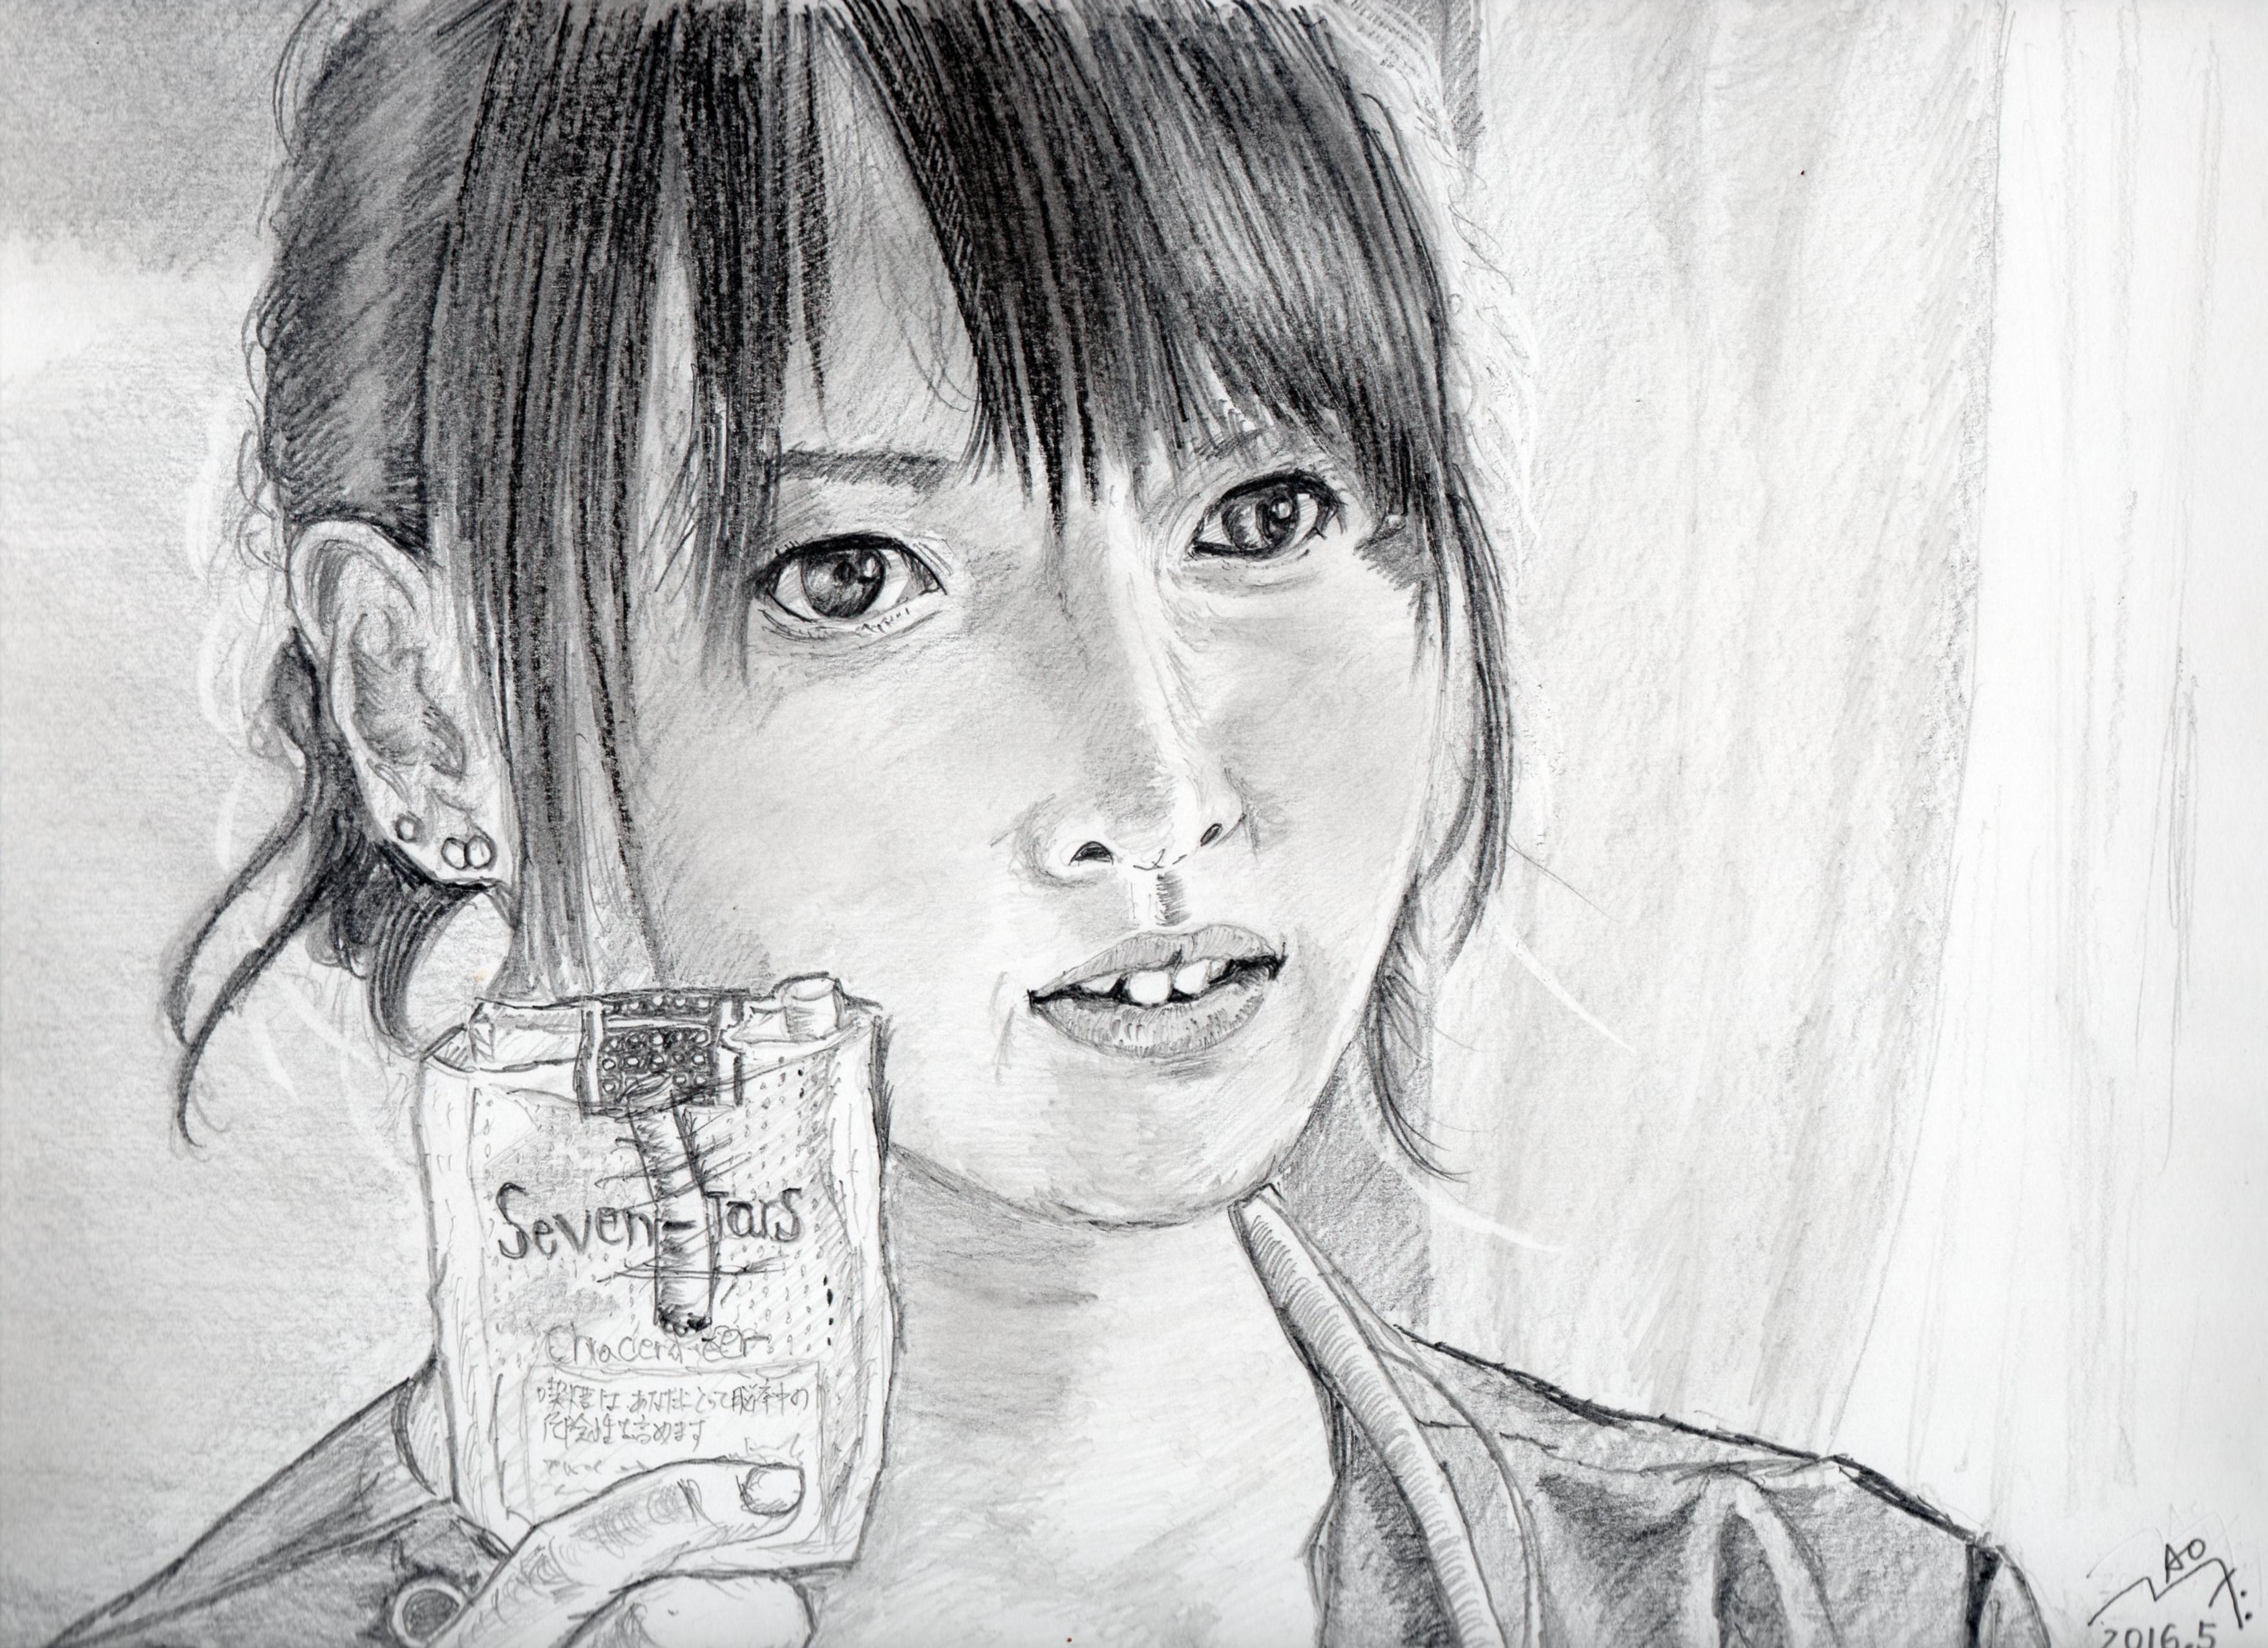 戸田恵梨香の鉛筆画似顔絵